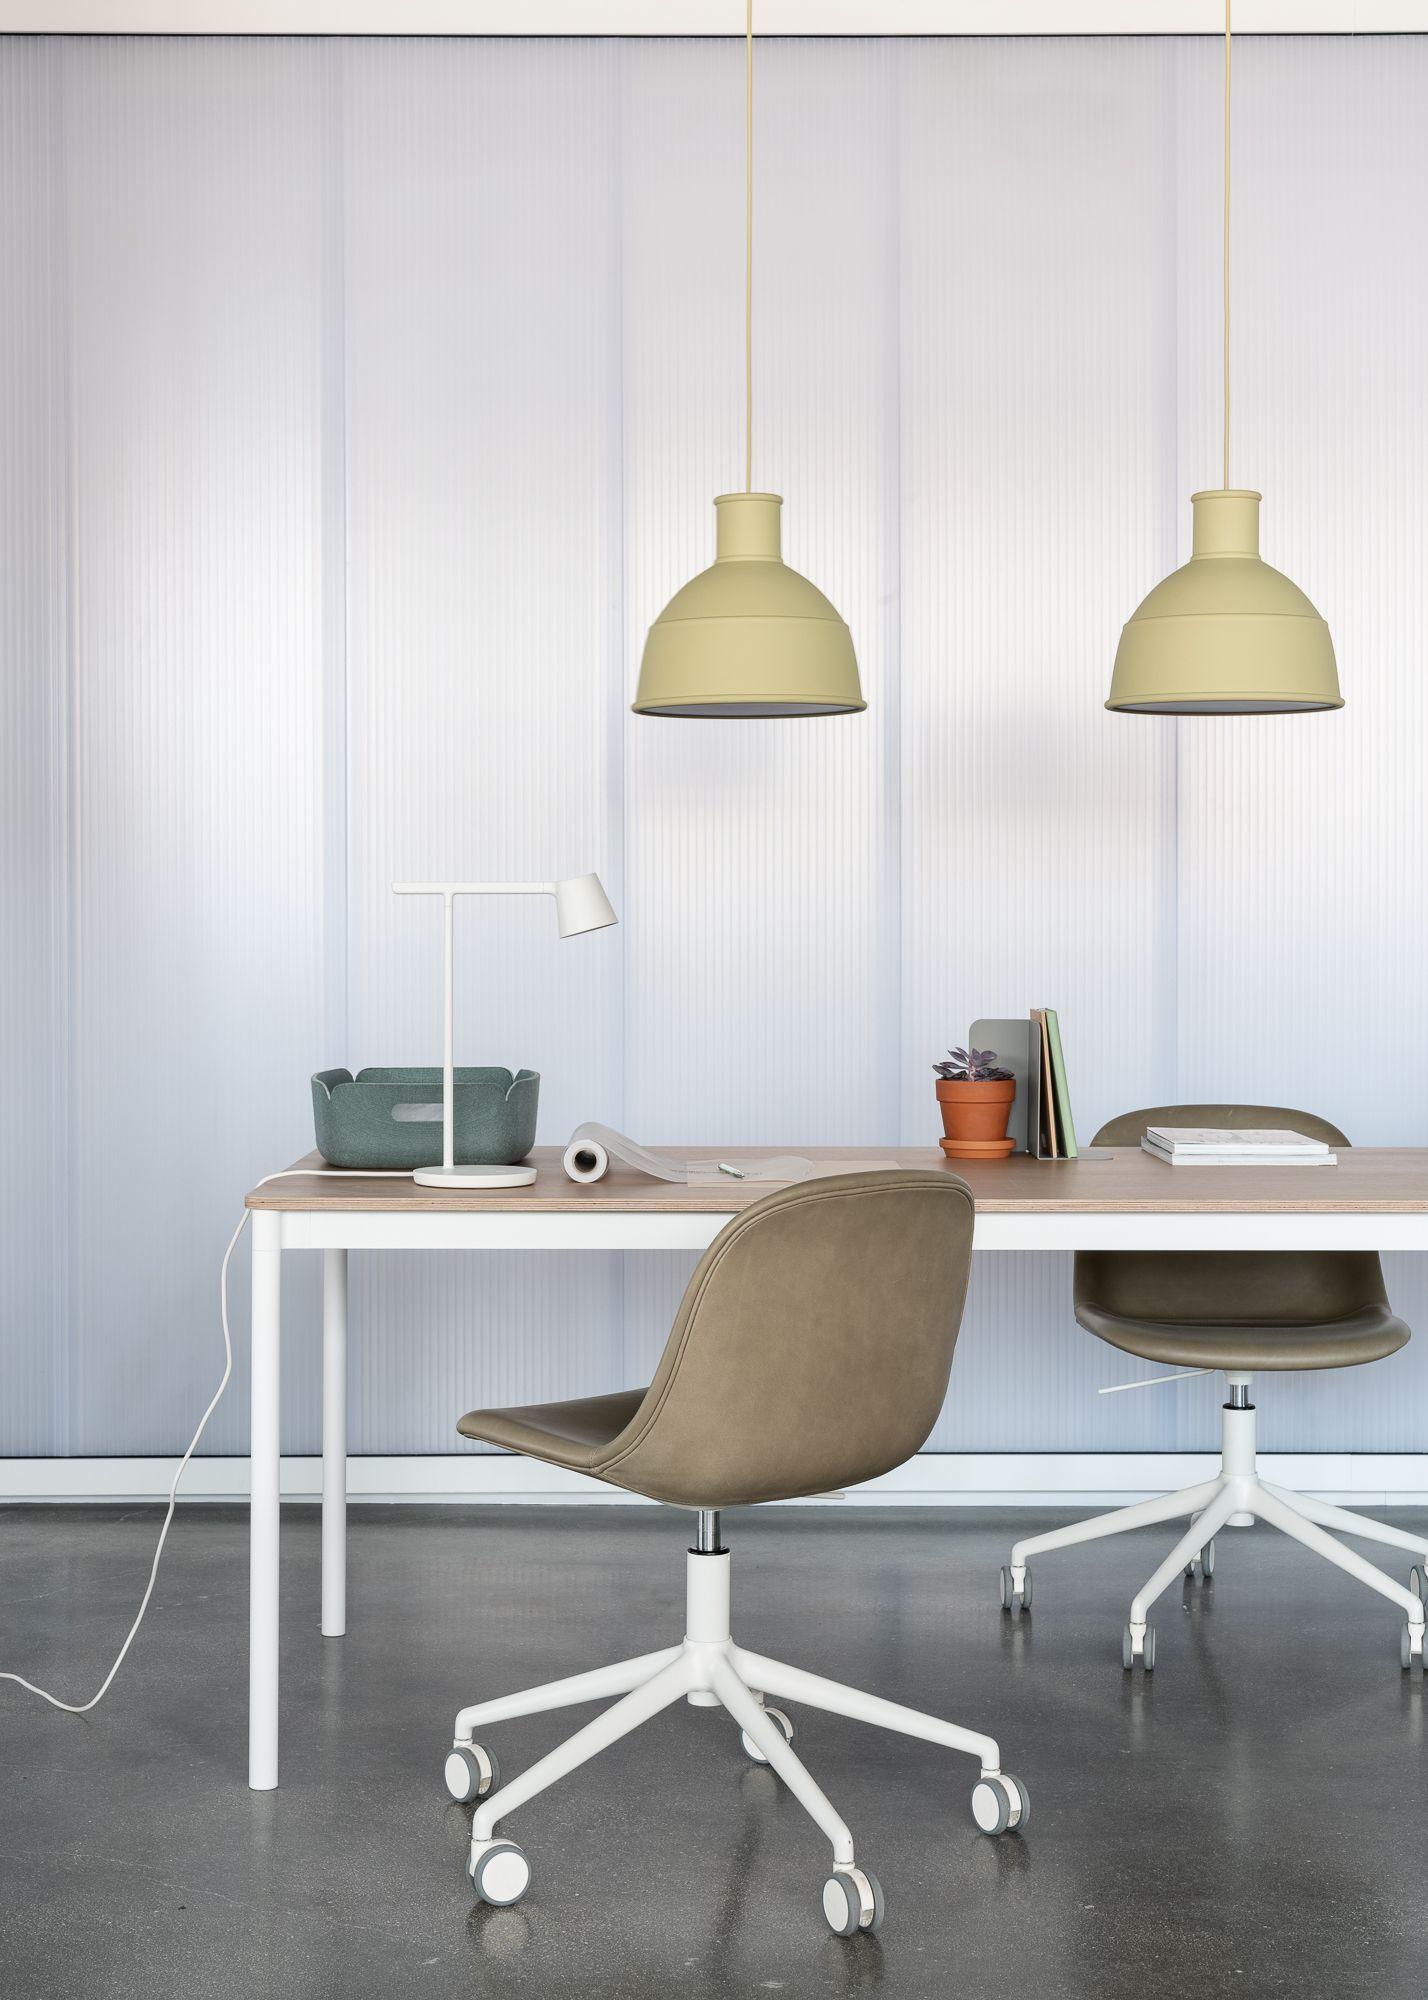 Modern And Minimal Scandinavian Office Interior Inspiration From Muuto The Fiber Side Chair Builds On Modern Office Interiors Interior Furniture Design Modern